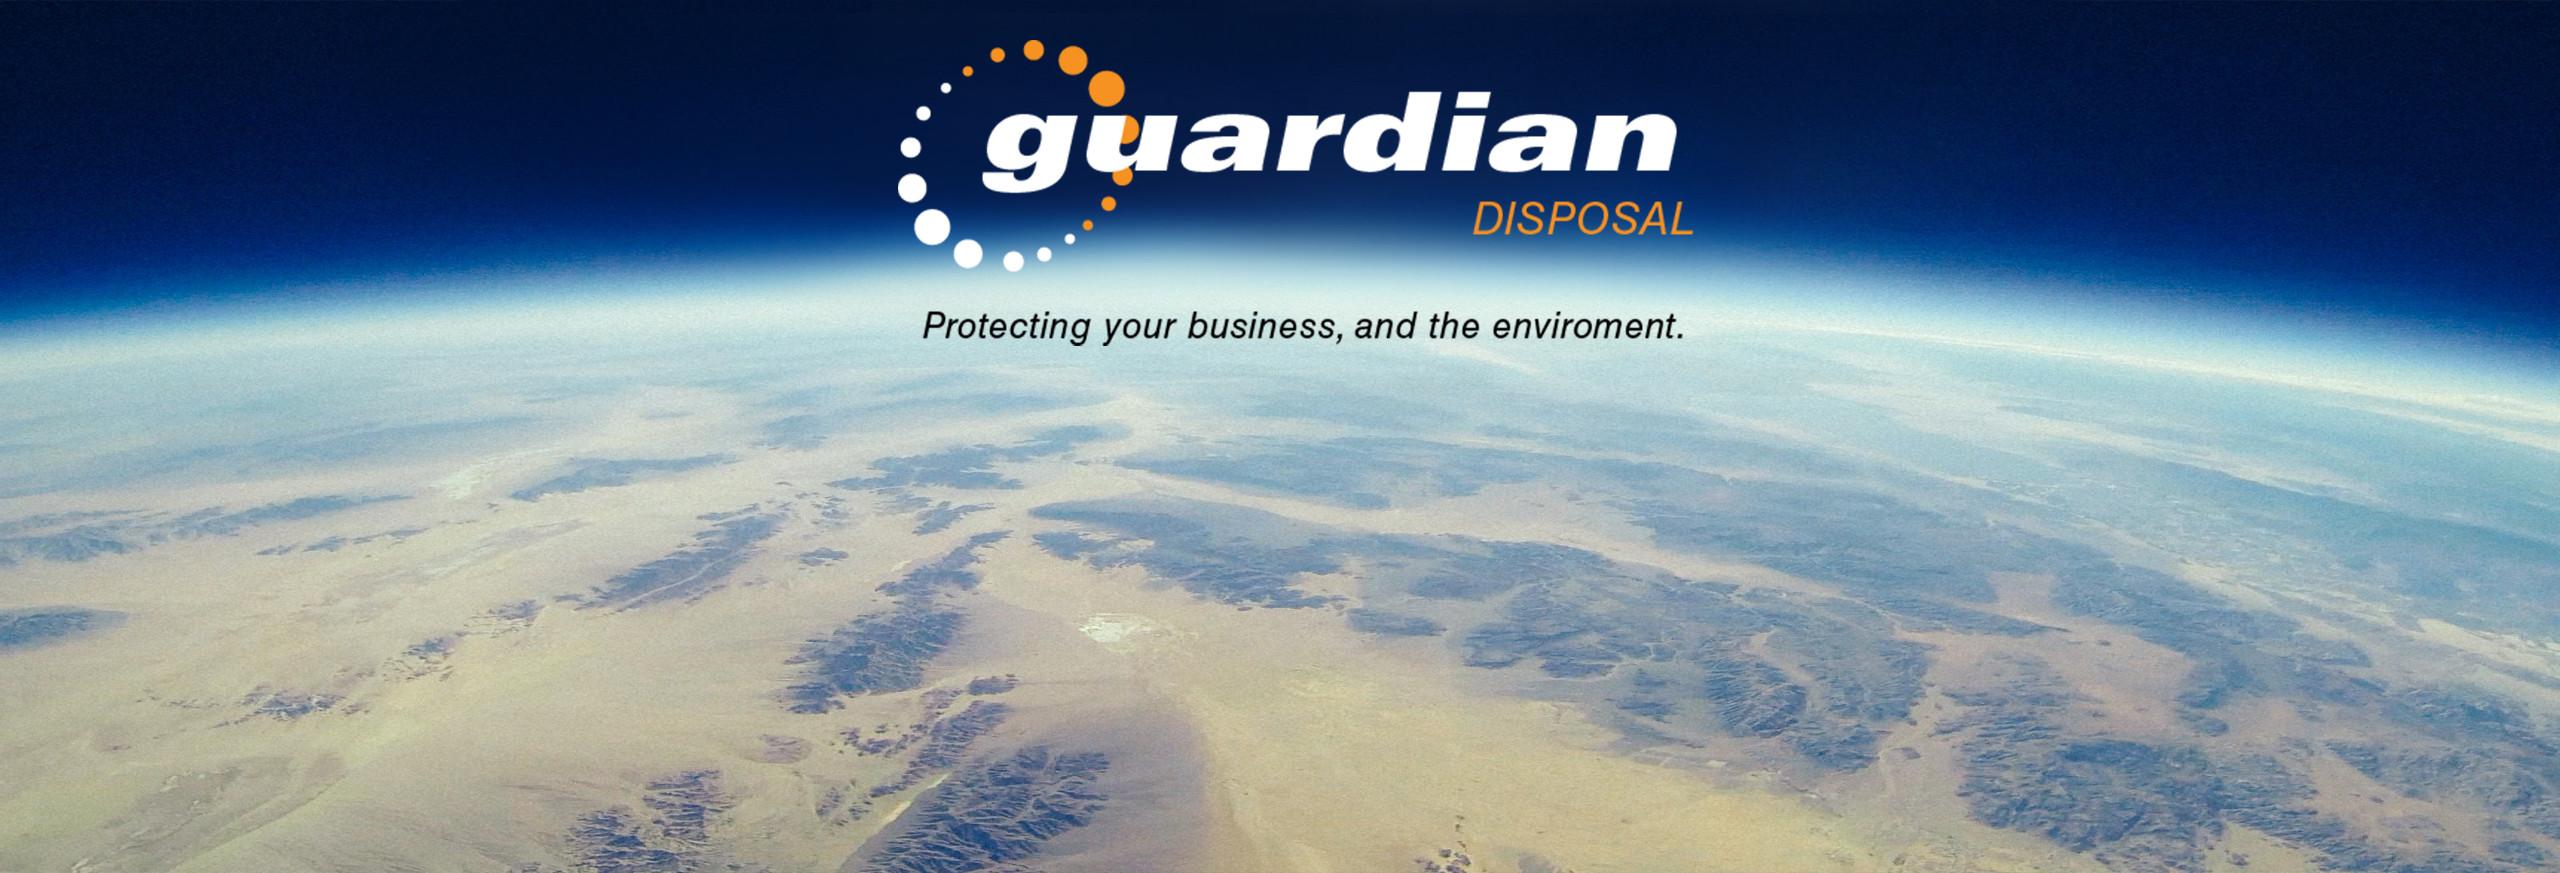 Guardian_Disposal_Banner_JPG